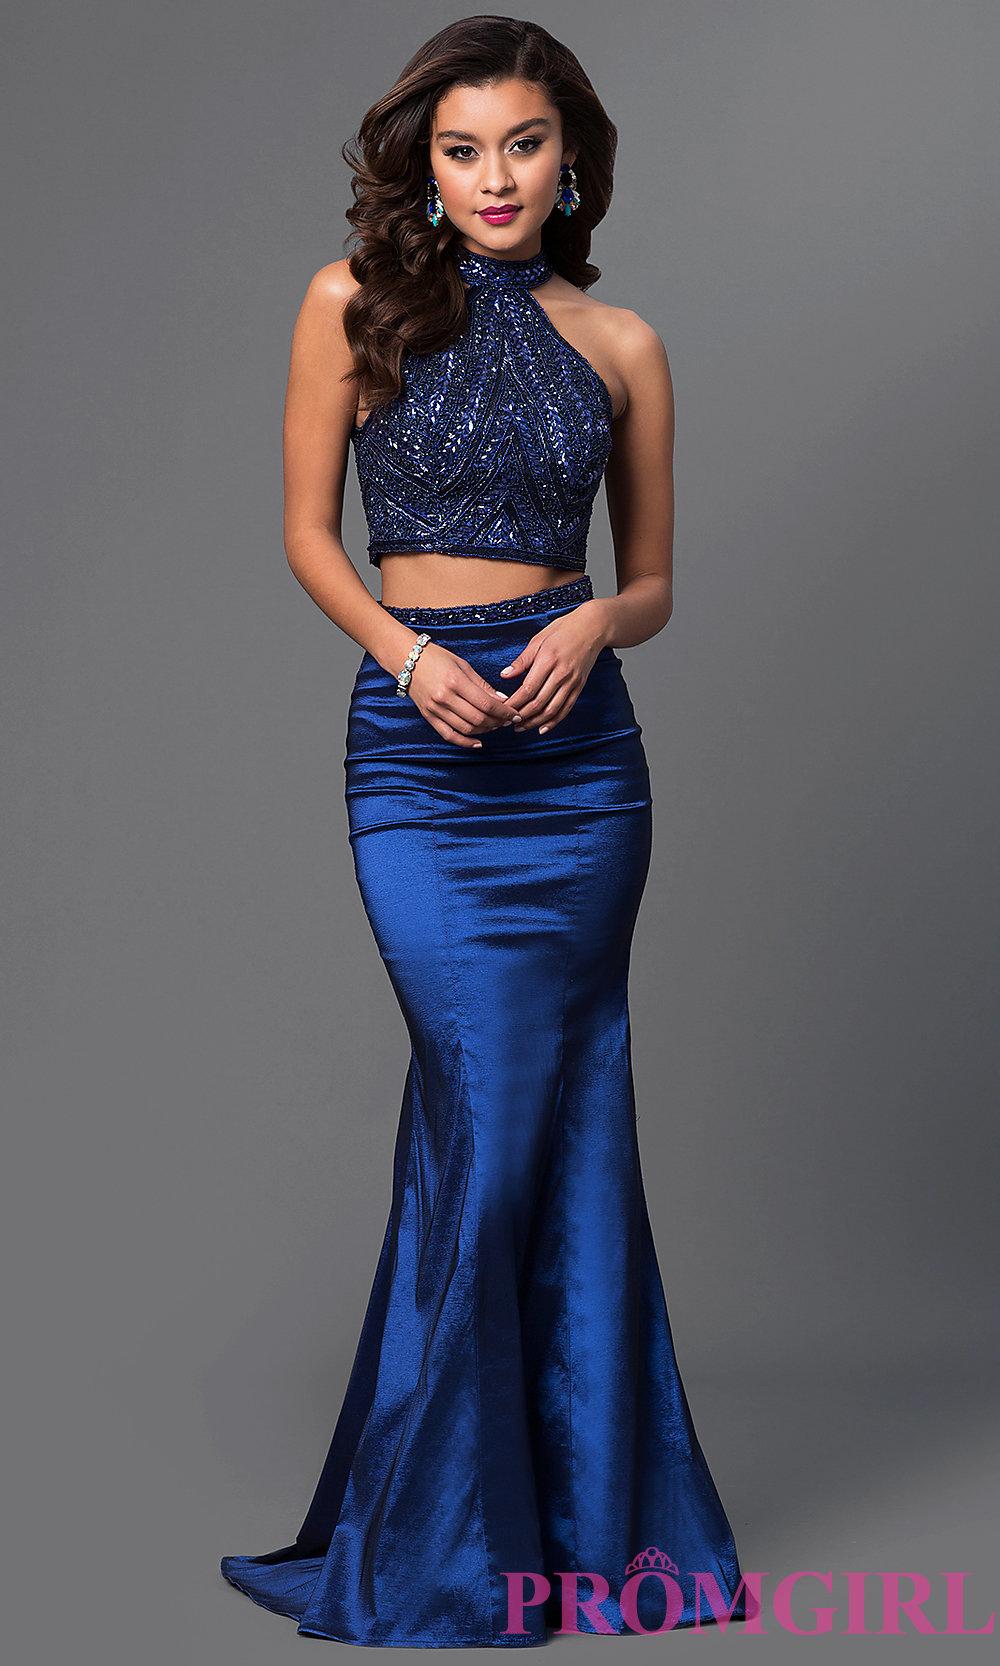 7344b74646 Long Halter To Prom Dresses - Plus Size Prom Dresses